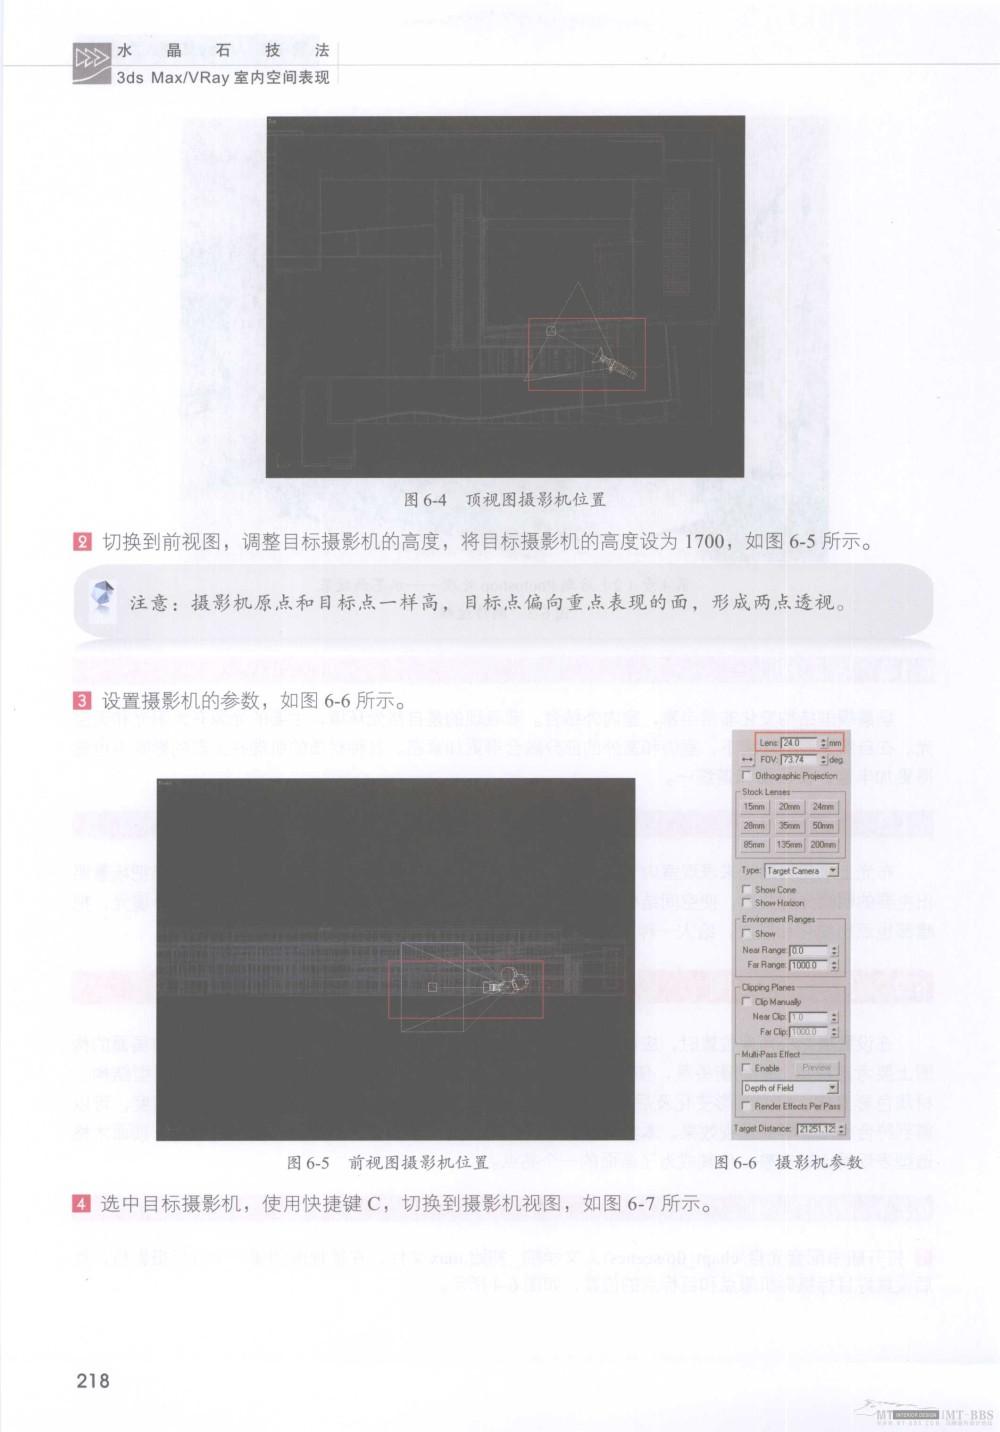 水晶石技法-3ds_Max&VRay室内空间表现_水晶石技法-3ds_Max&VRay室内空间表现_页面_224.jpg